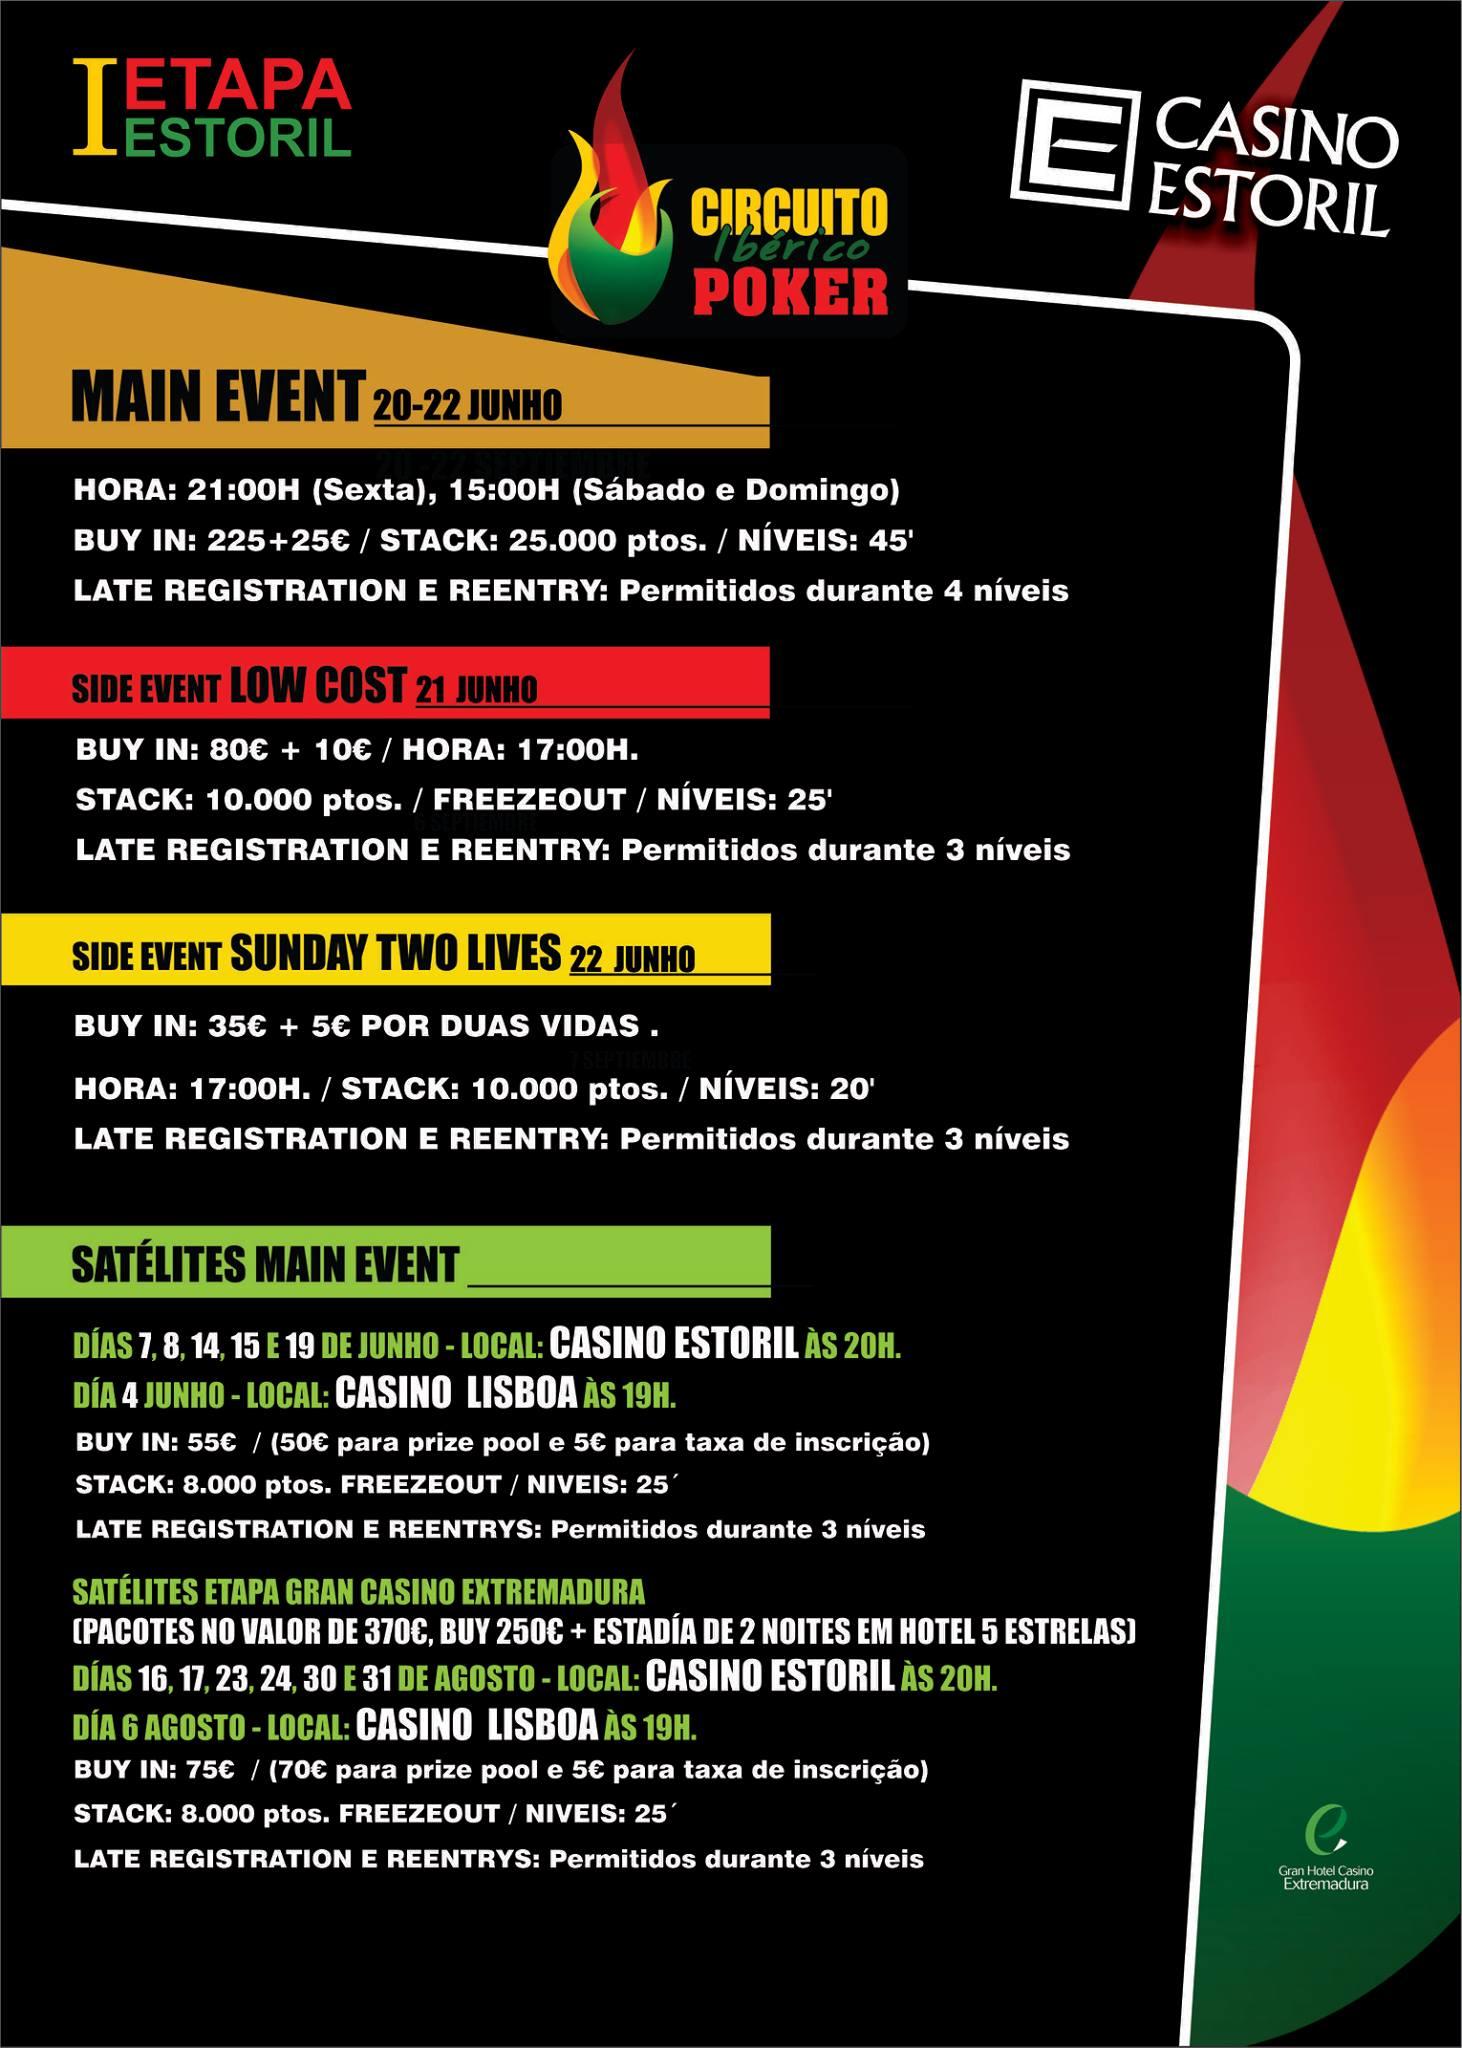 Etapa 1 do Circuito Ibérico de Poker no Casino do Estoril de 20 a 22 de Junho 101